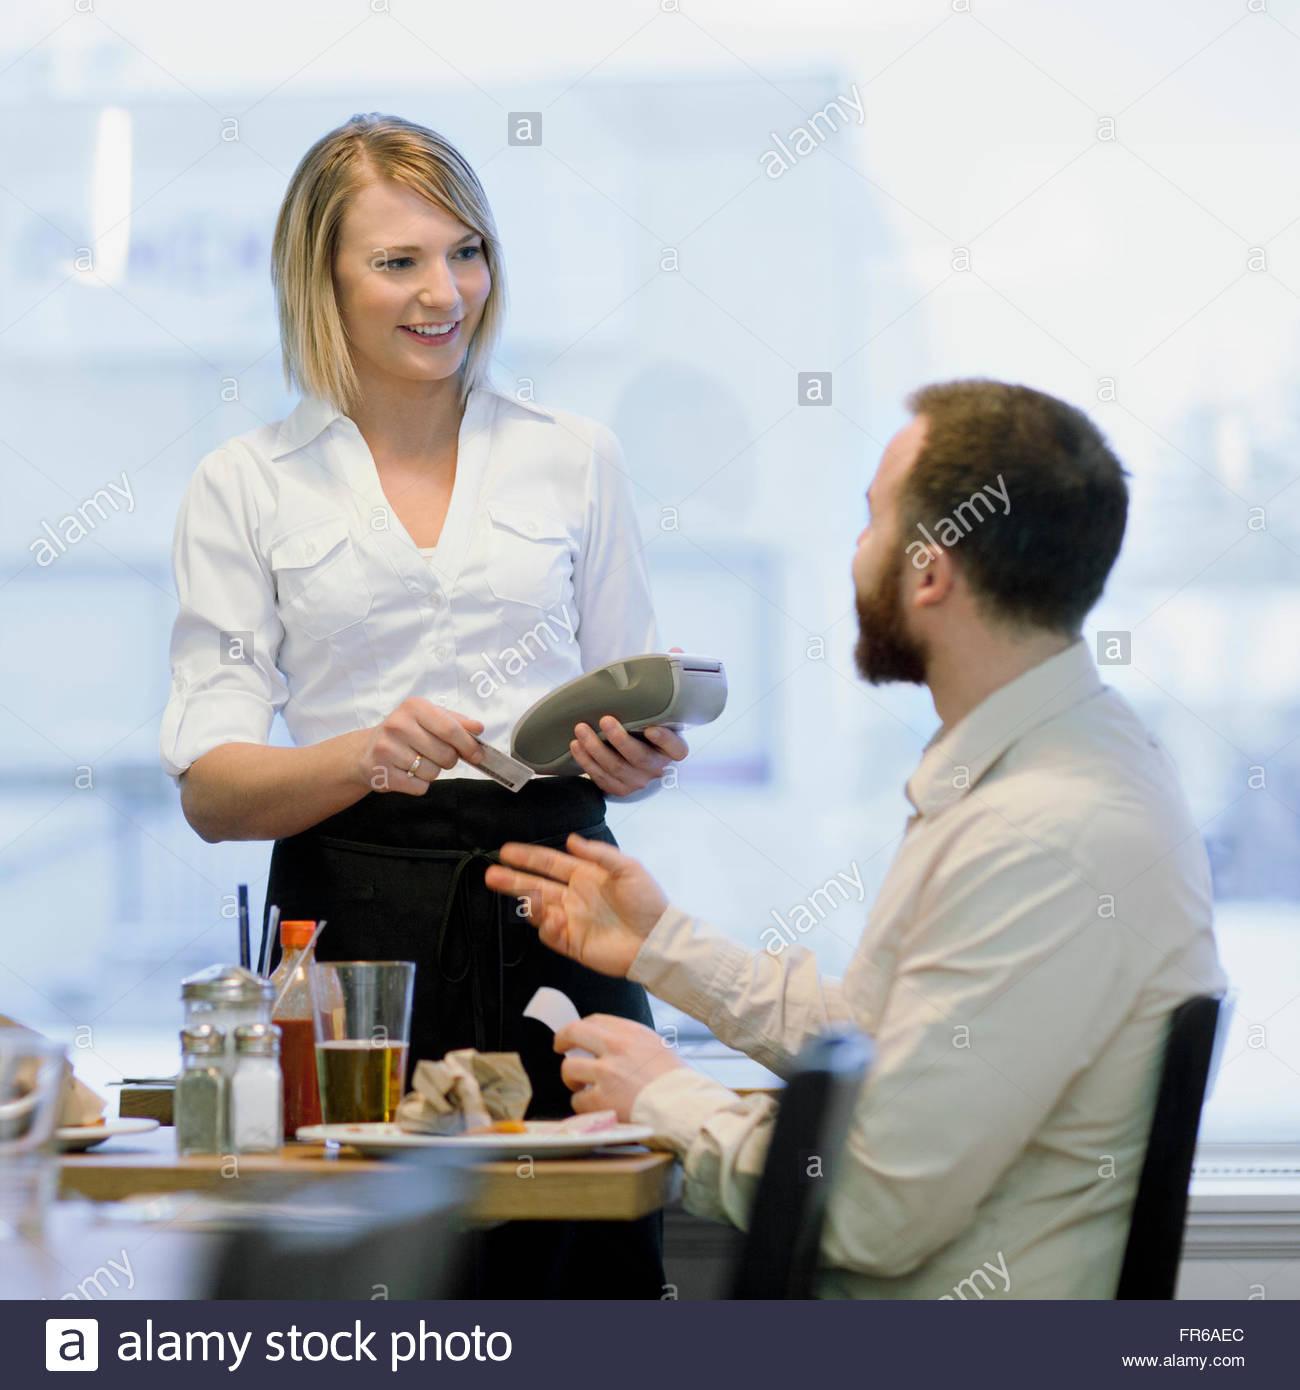 waitress completing debit transaction - Stock Image